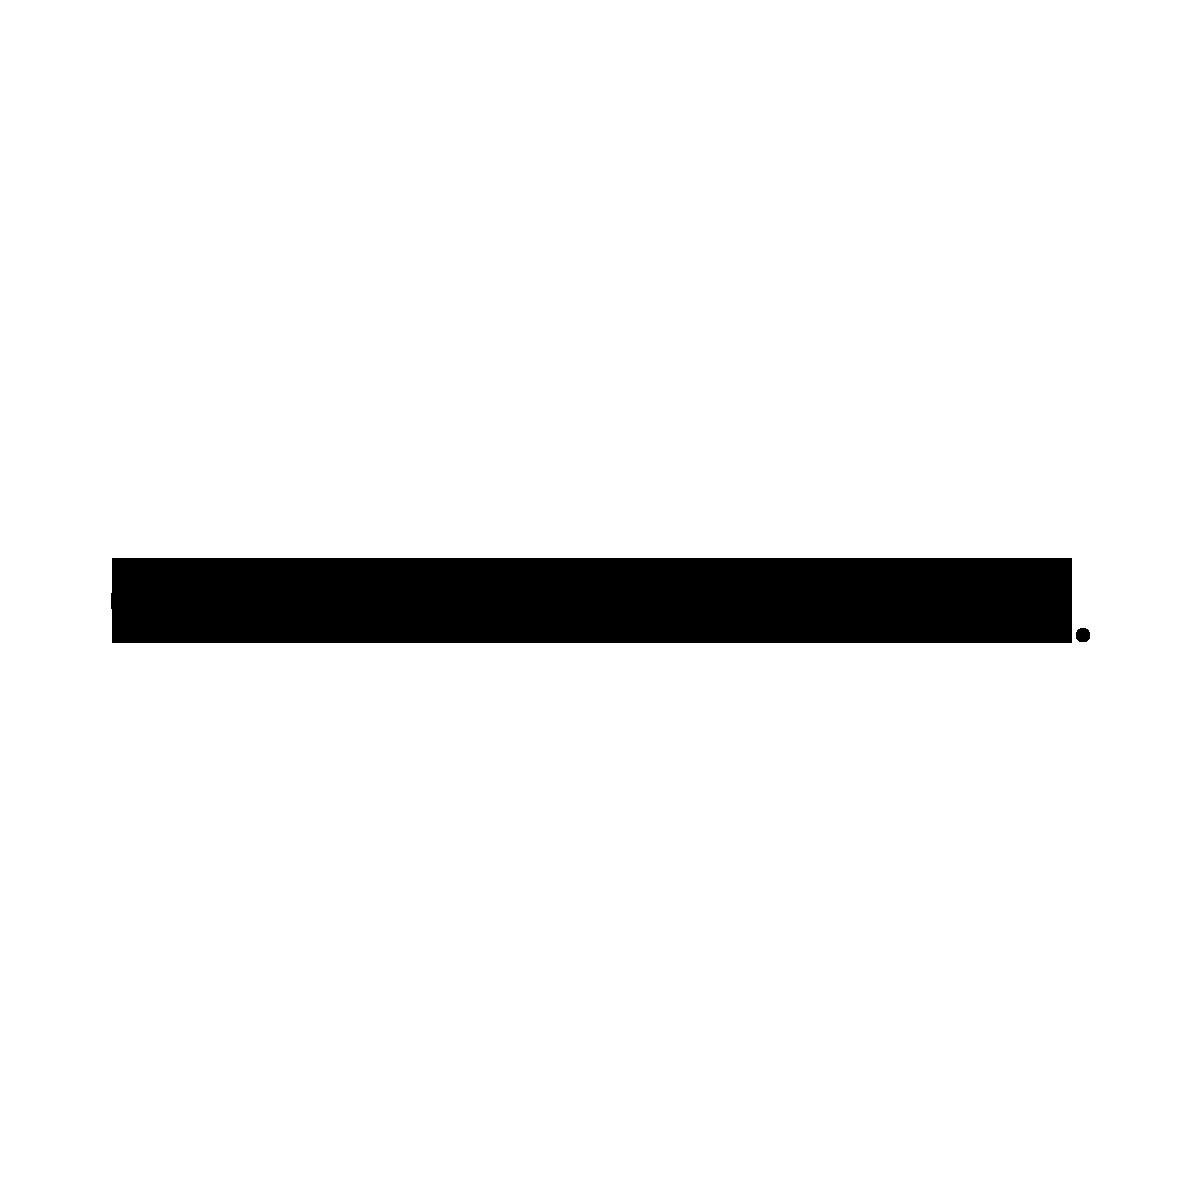 zwarte sneaker instapper van shabbies amsterdam in structuurleer met wolvoering 101020008 detail structuurleer